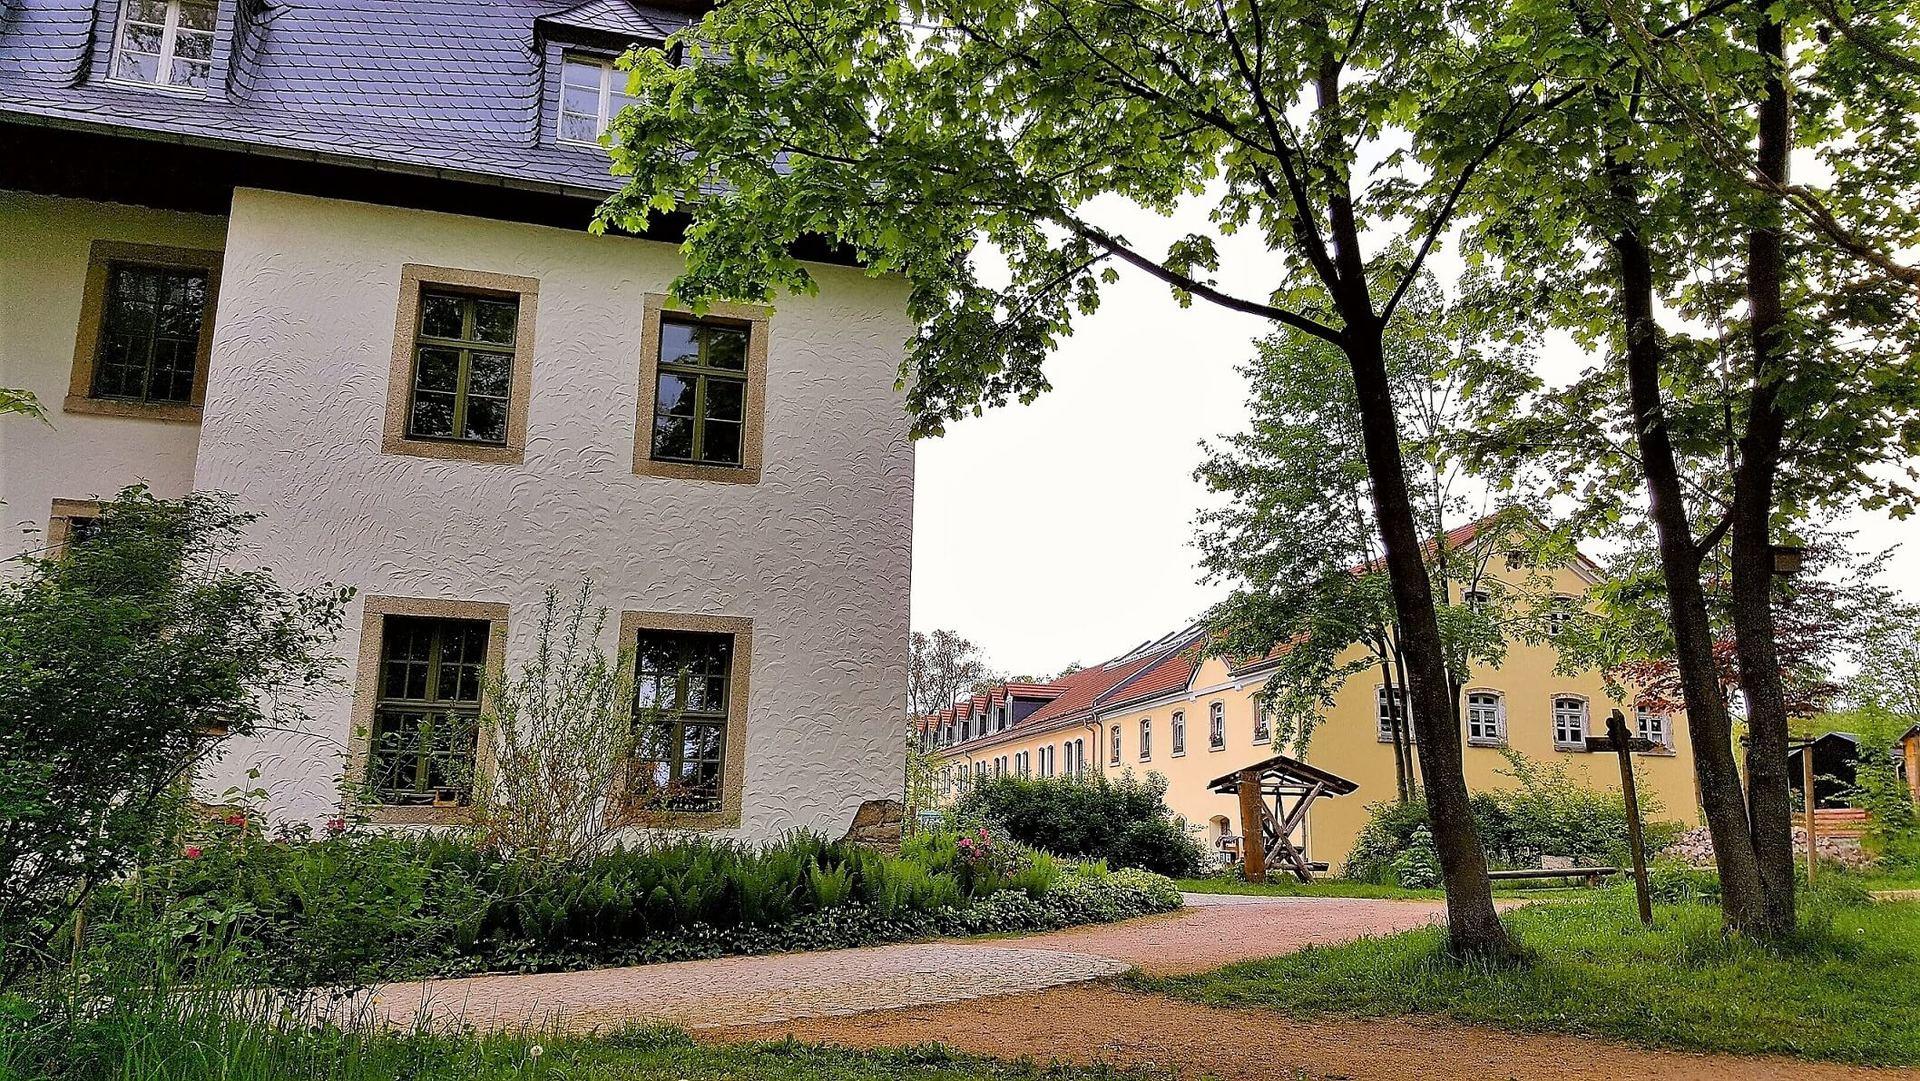 Rittergut Adlershof zu Oberlauterbach - Blick in Gutshof © Jens Reiher